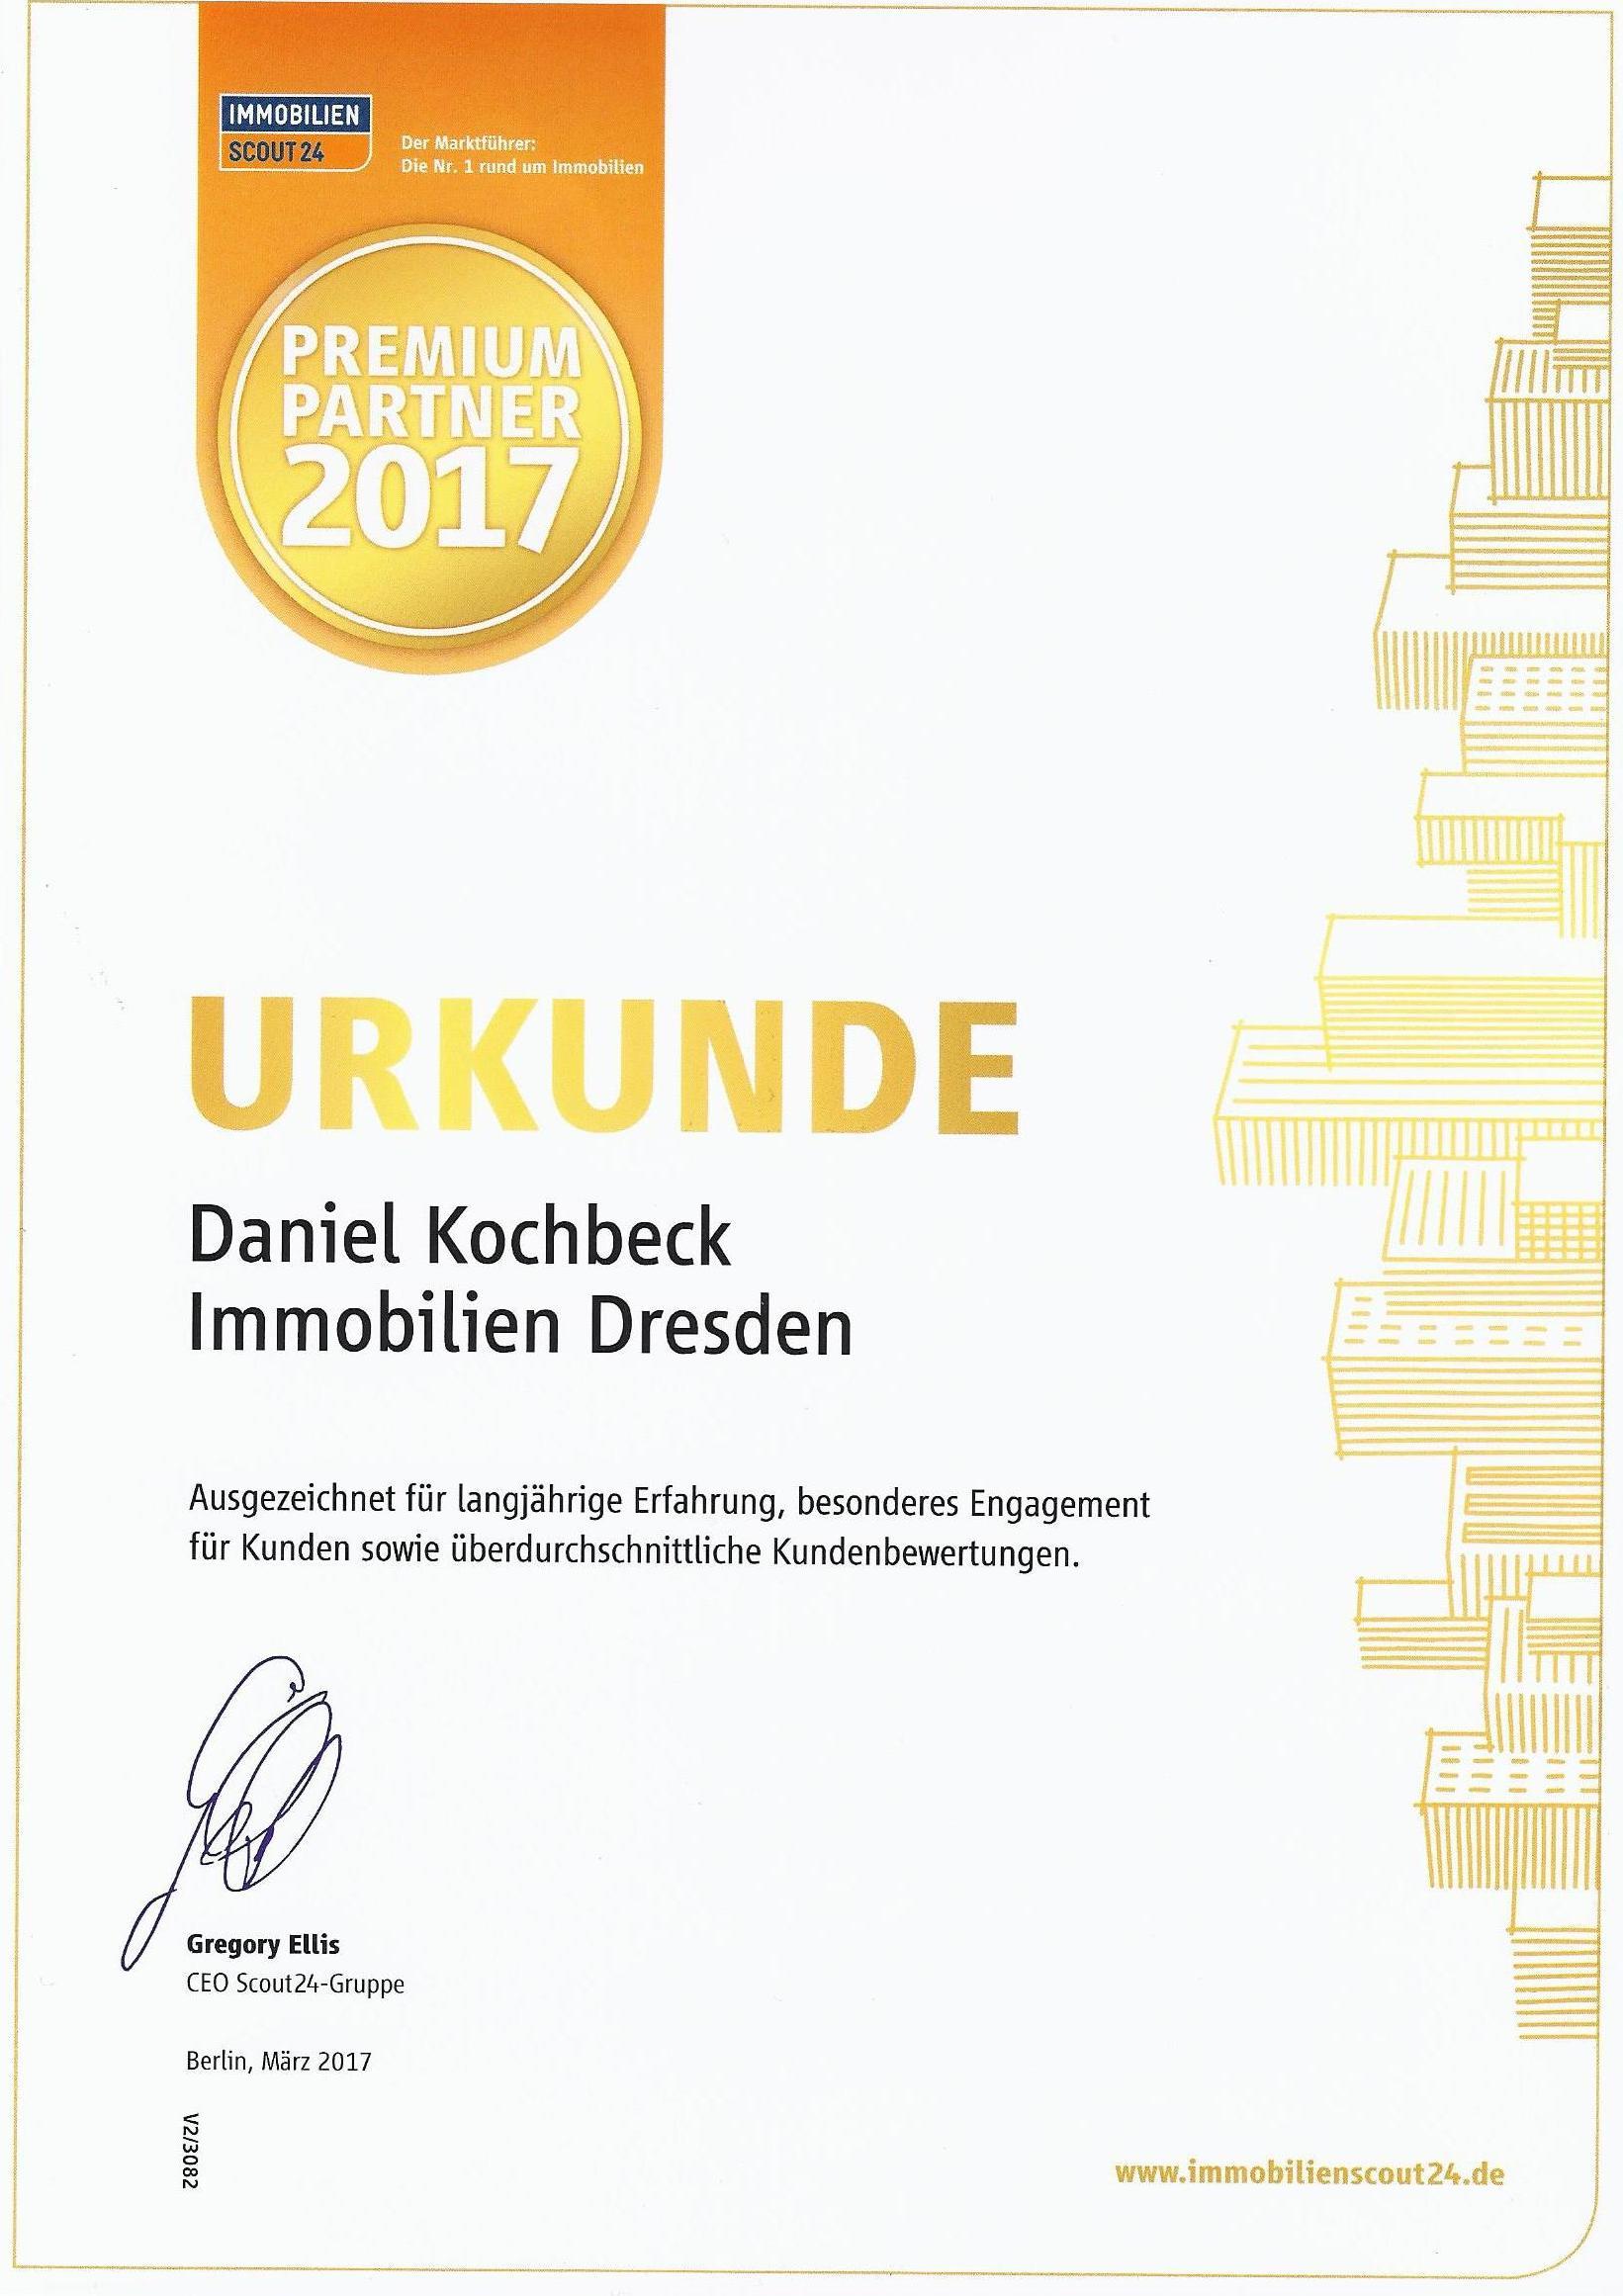 Kochbeck Immobilien Dresden